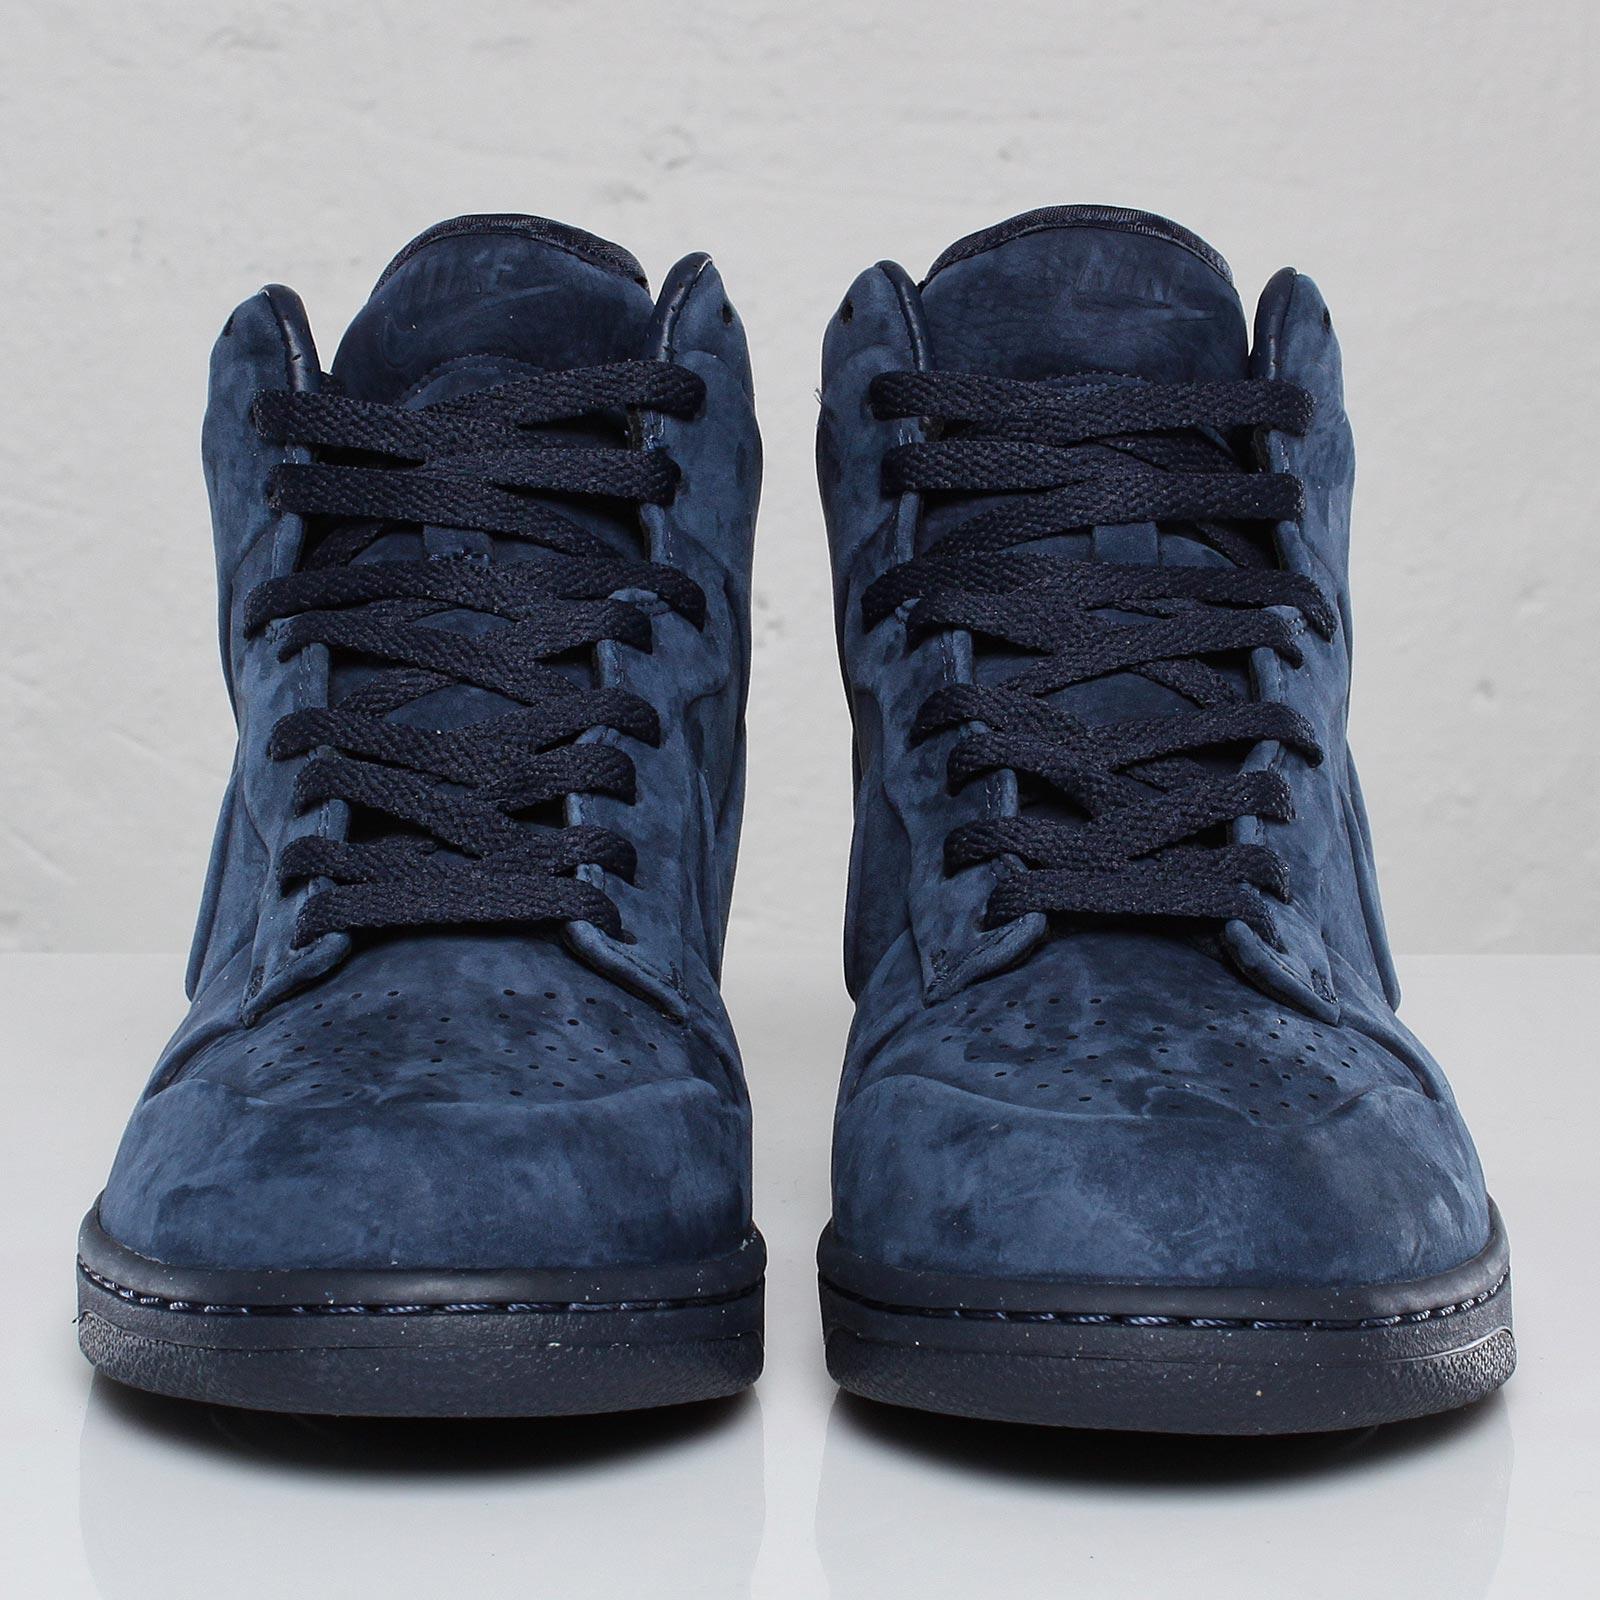 timeless design d5626 69ca5 Nike Dunk High VT Premium - 102638 - Sneakersnstuff   sneakers   streetwear  online since 1999